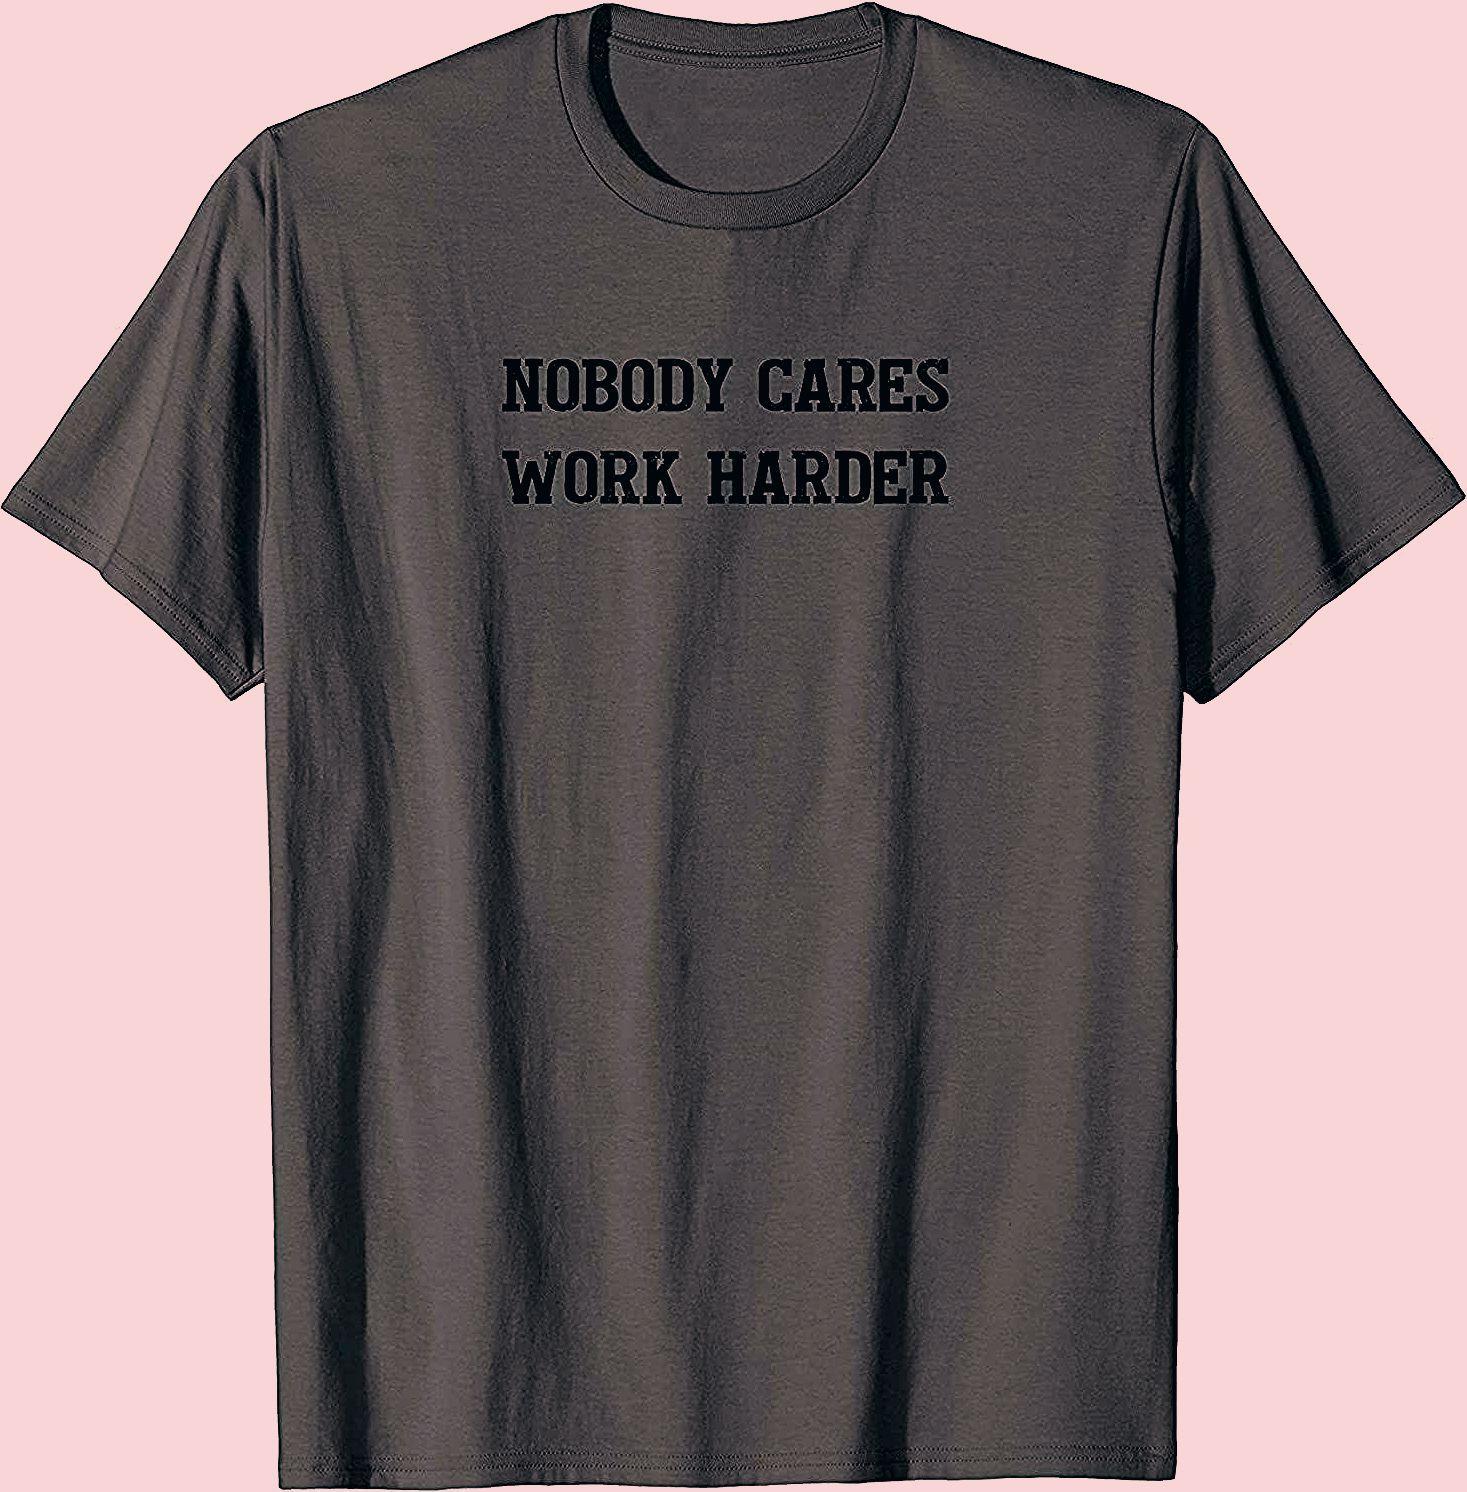 Photo of Nobody Cares Work Harder Motivational Tee T-Shirt